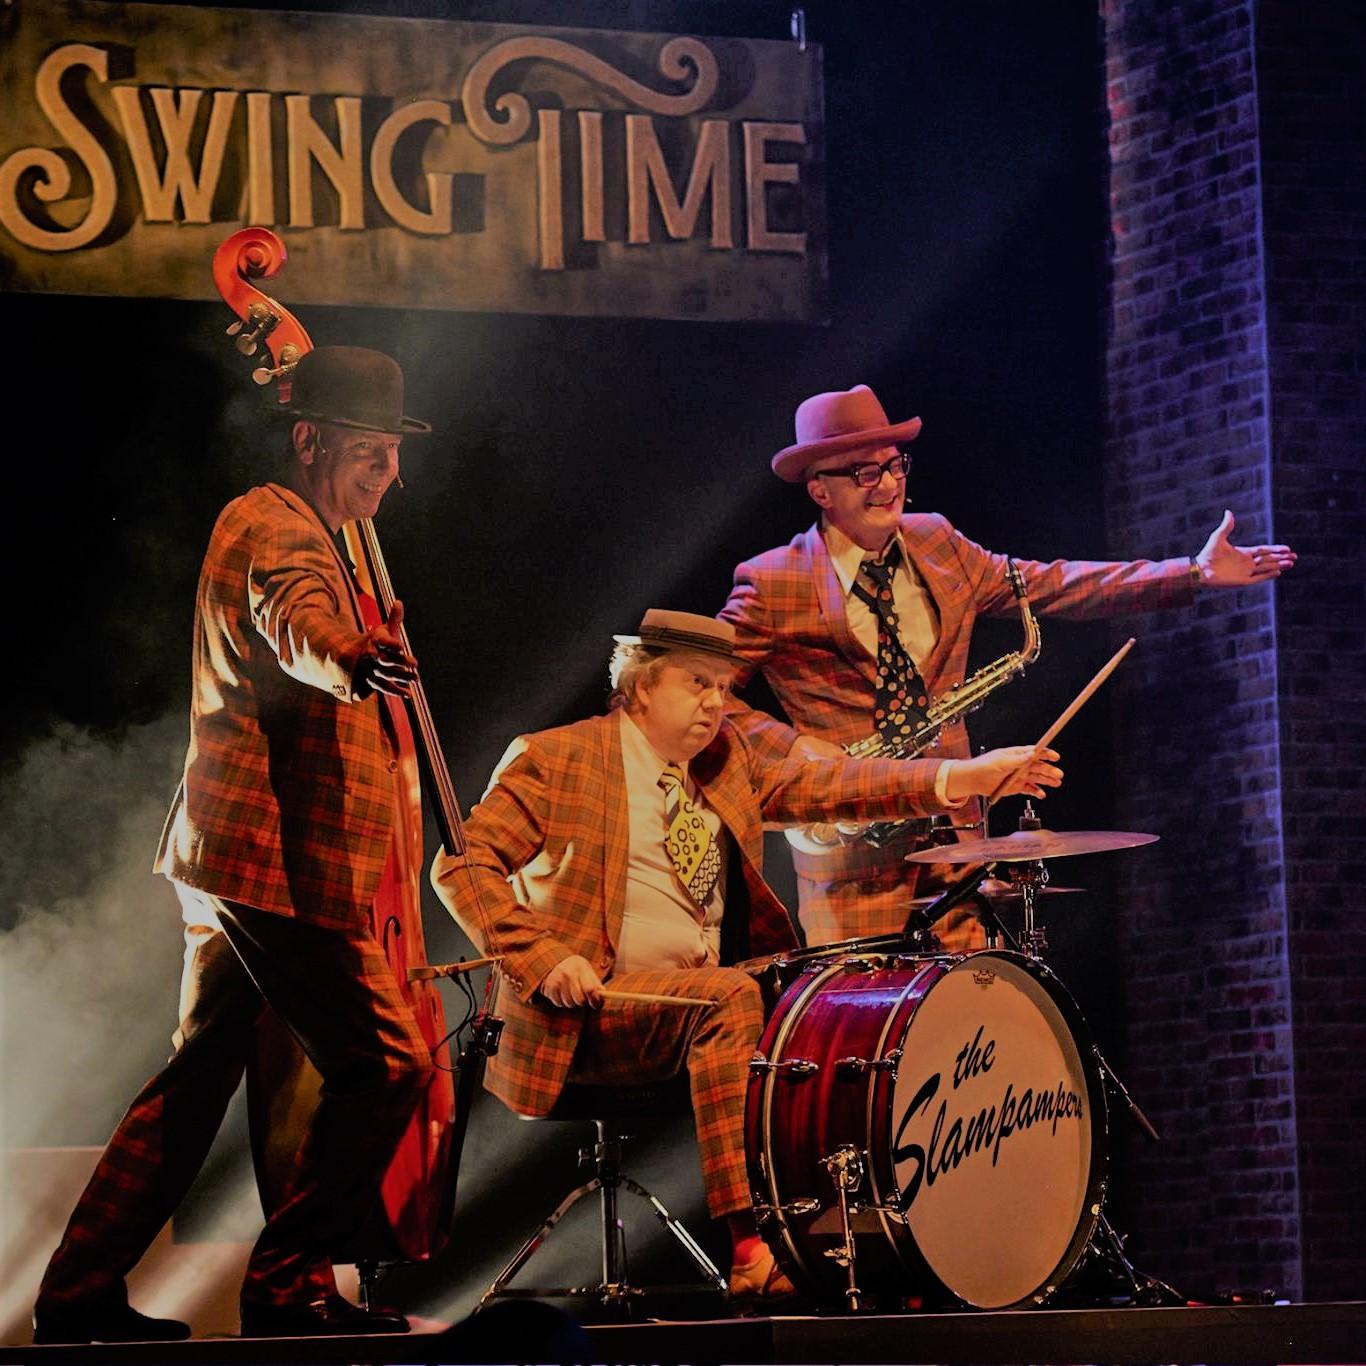 jazz straattheater. Gatsby stijl muziek trio